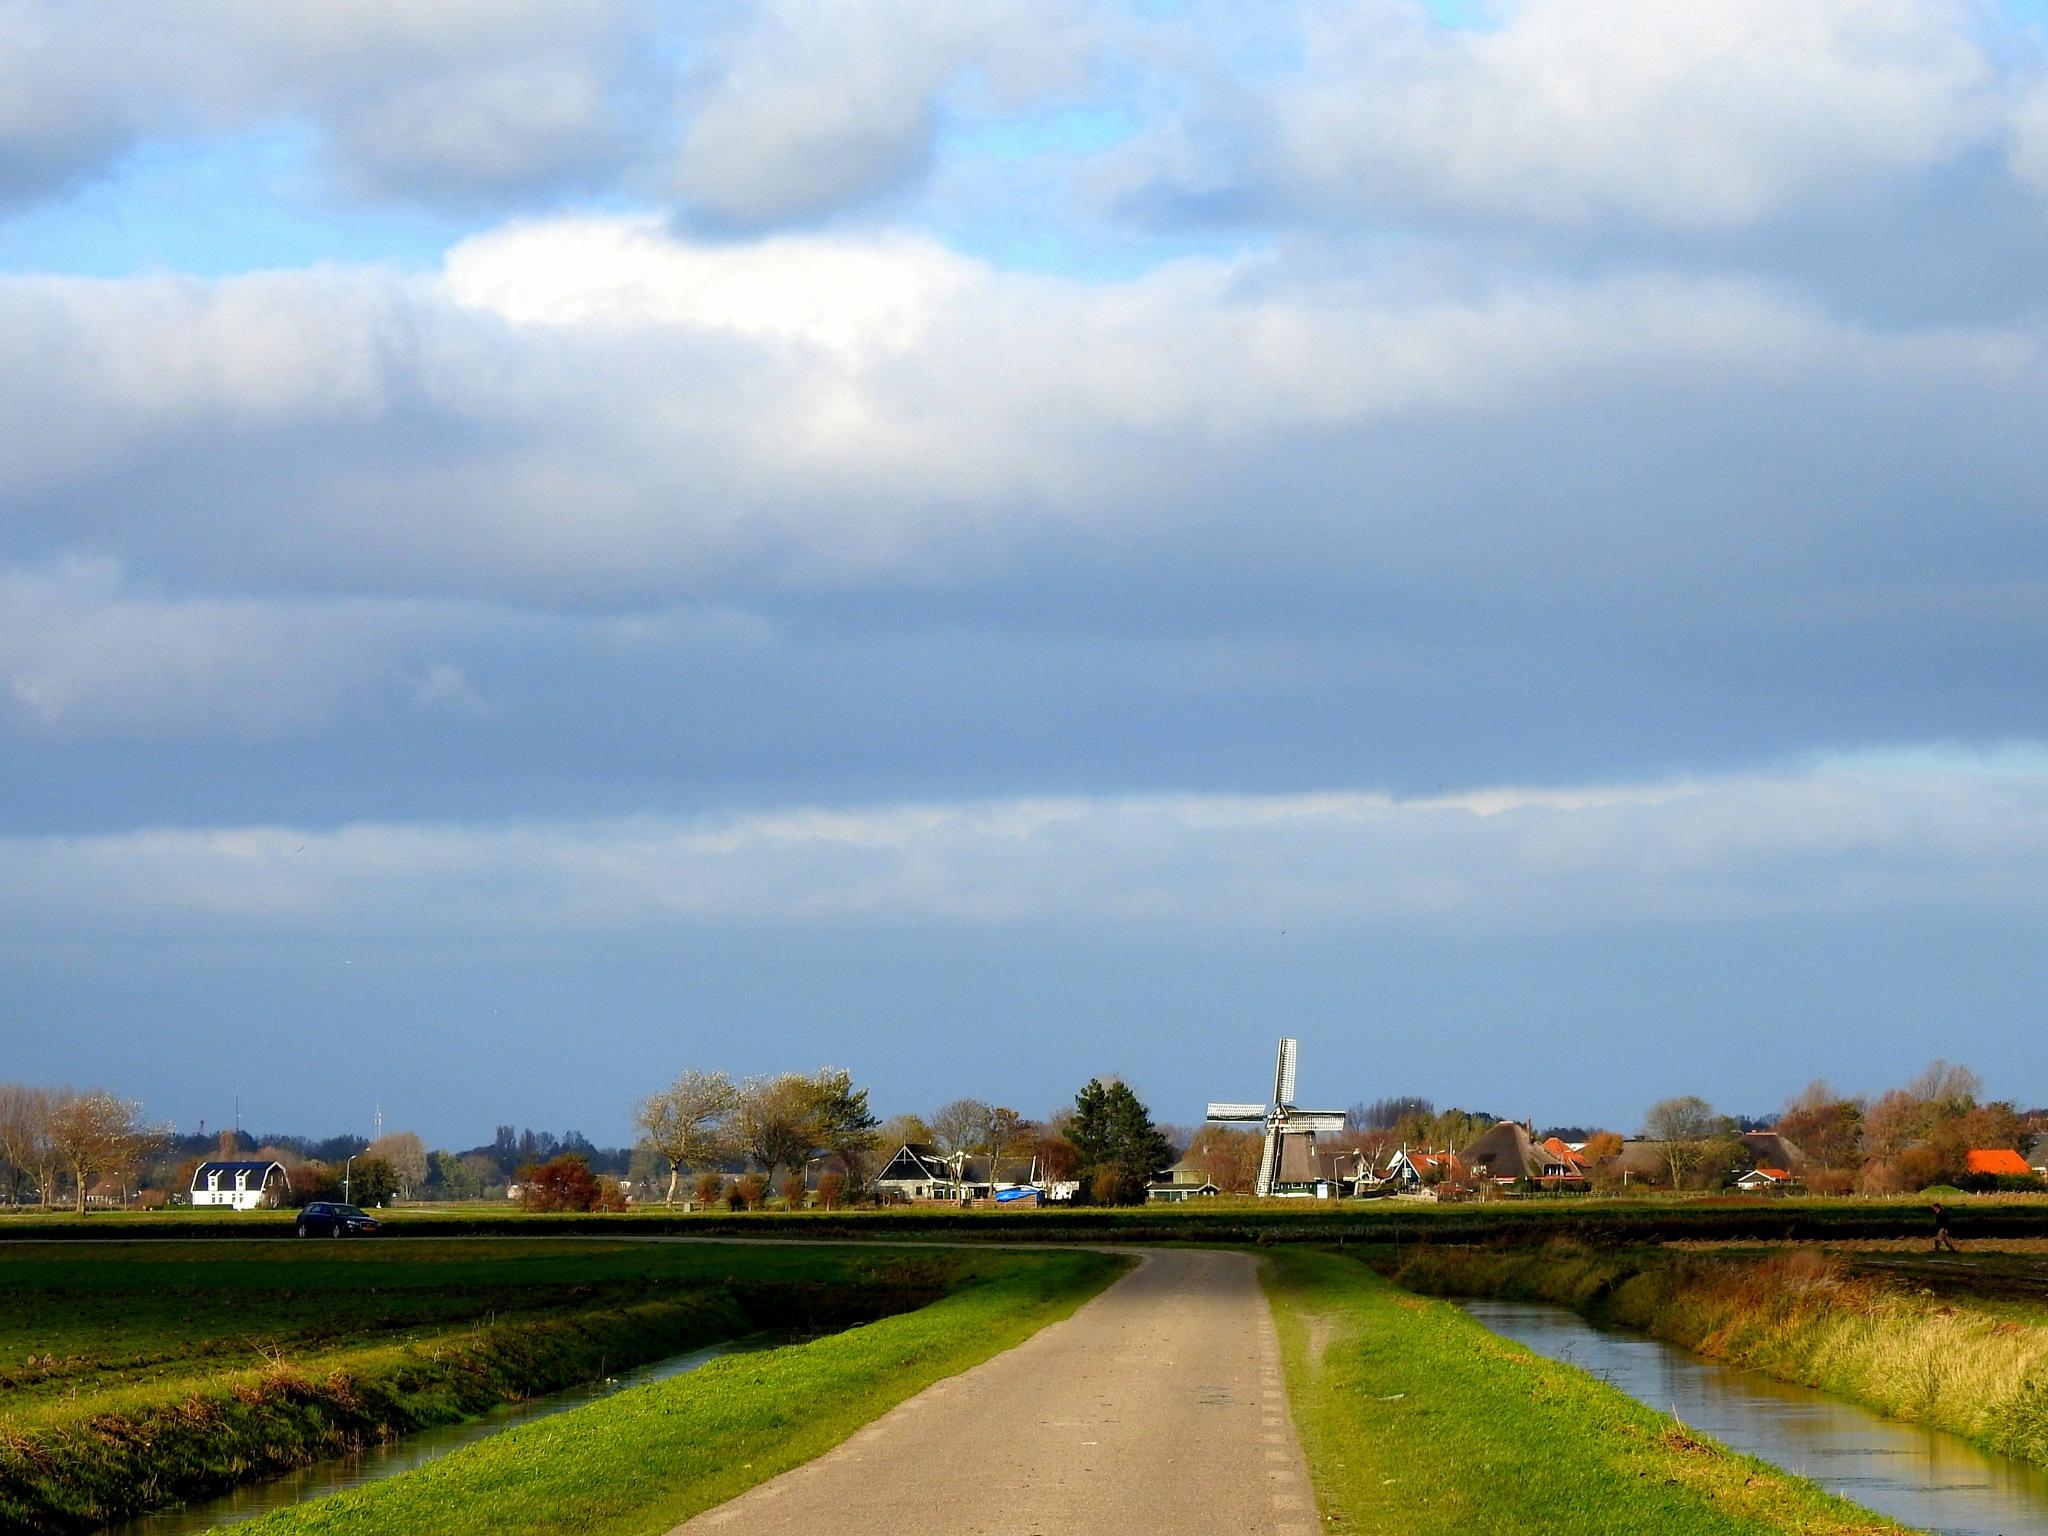 Groenveld holland by arina498